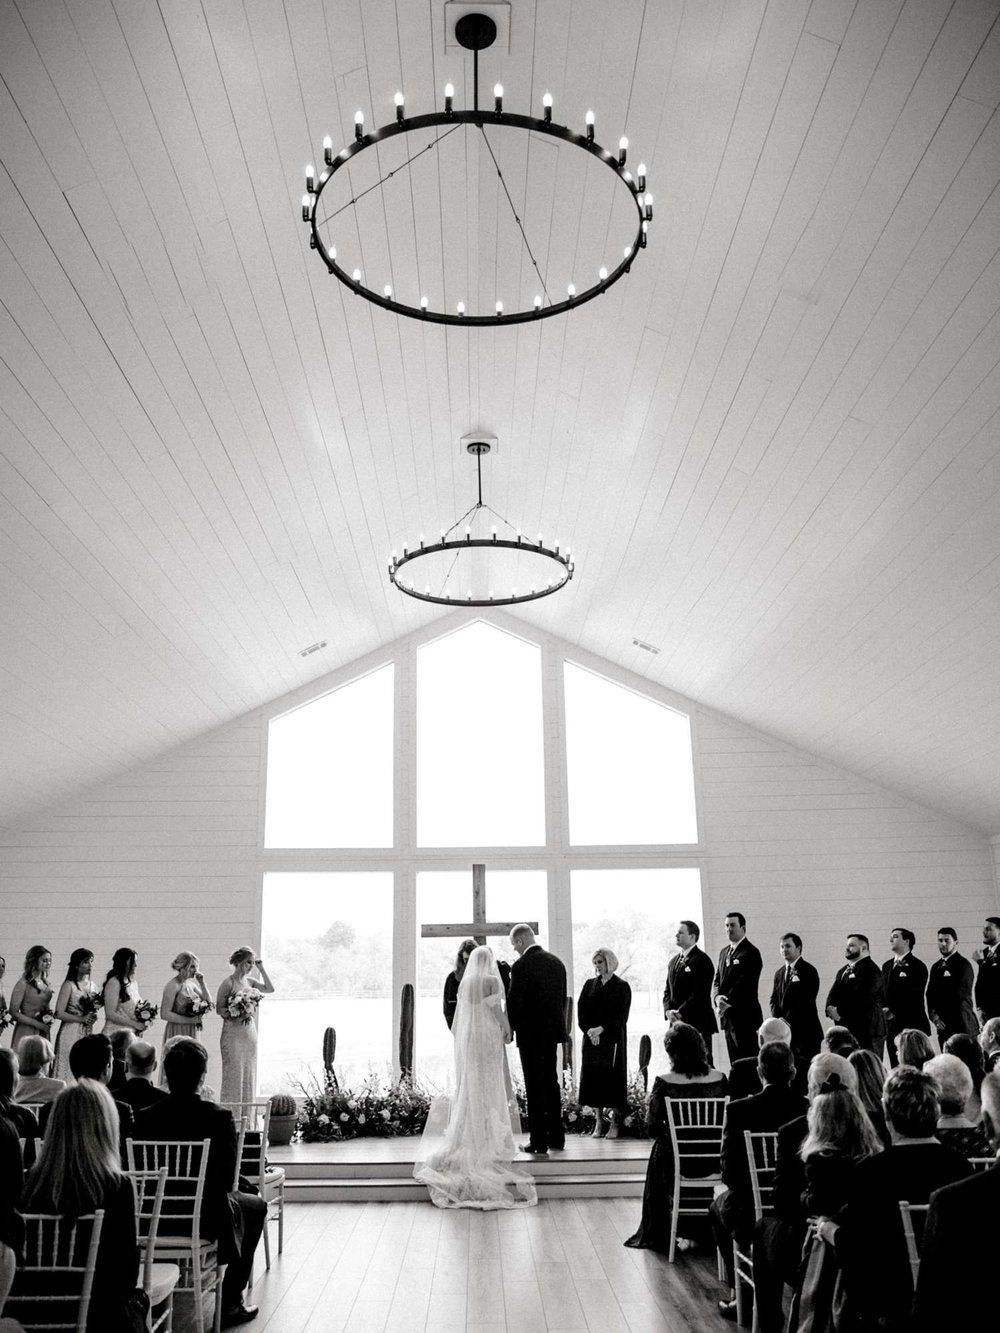 HEBERT_MORGAN_AND_CLAY_ALLEEJ_THE_FARMHOUSE_MONTGOMERY_TEXAS_WEDDING_0089.jpg